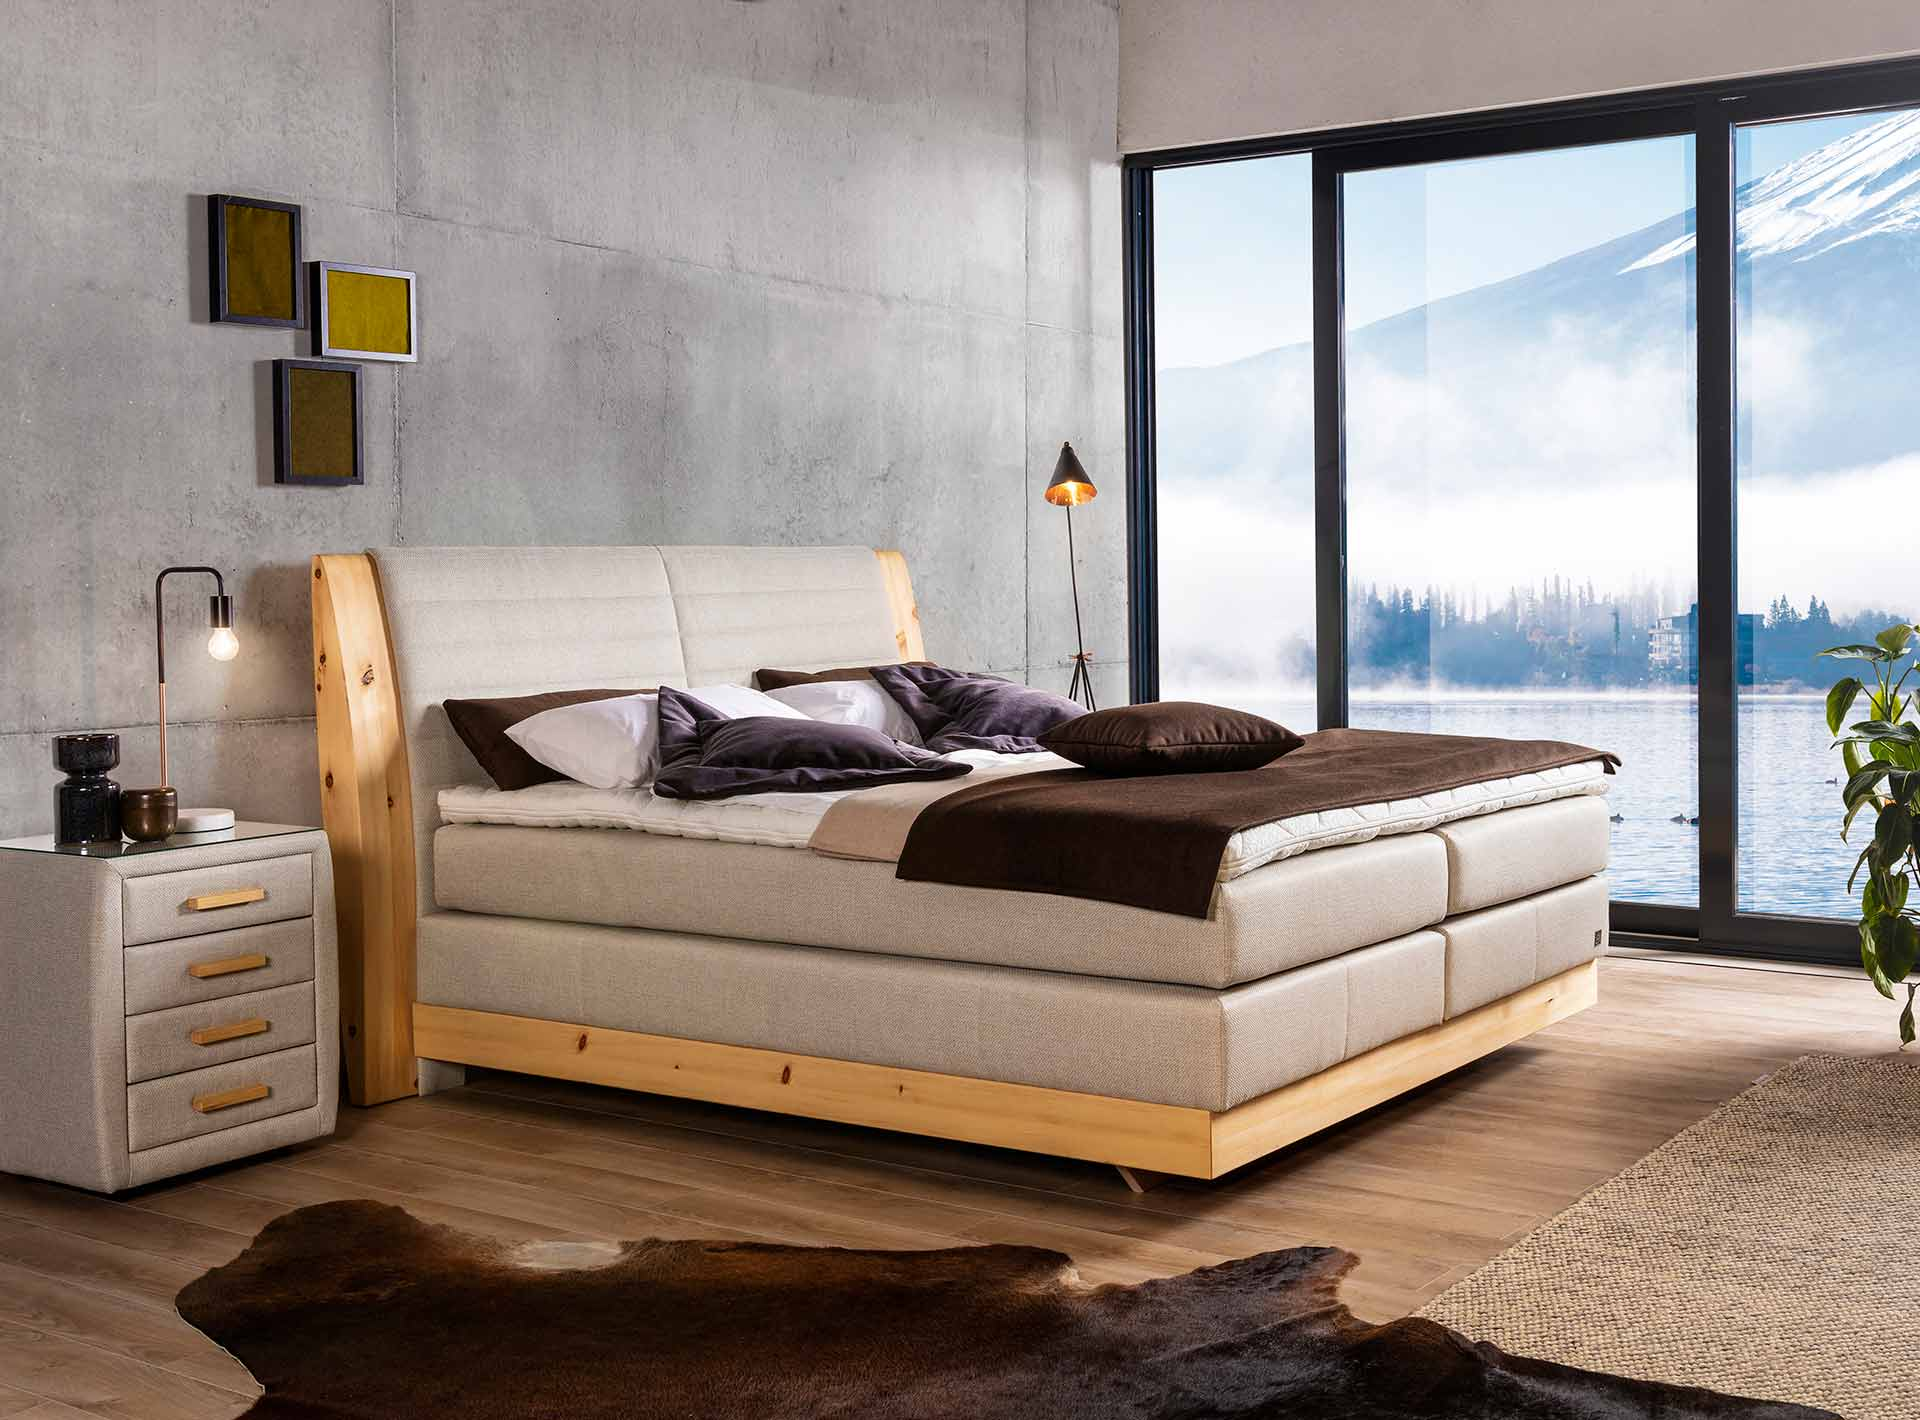 Full Size of Hohe Betten Berlin Runde Weiße Kinder Test Ottoversand Ruf Mit Aufbewahrung Wohnwert Massiv Bett Hohe Betten